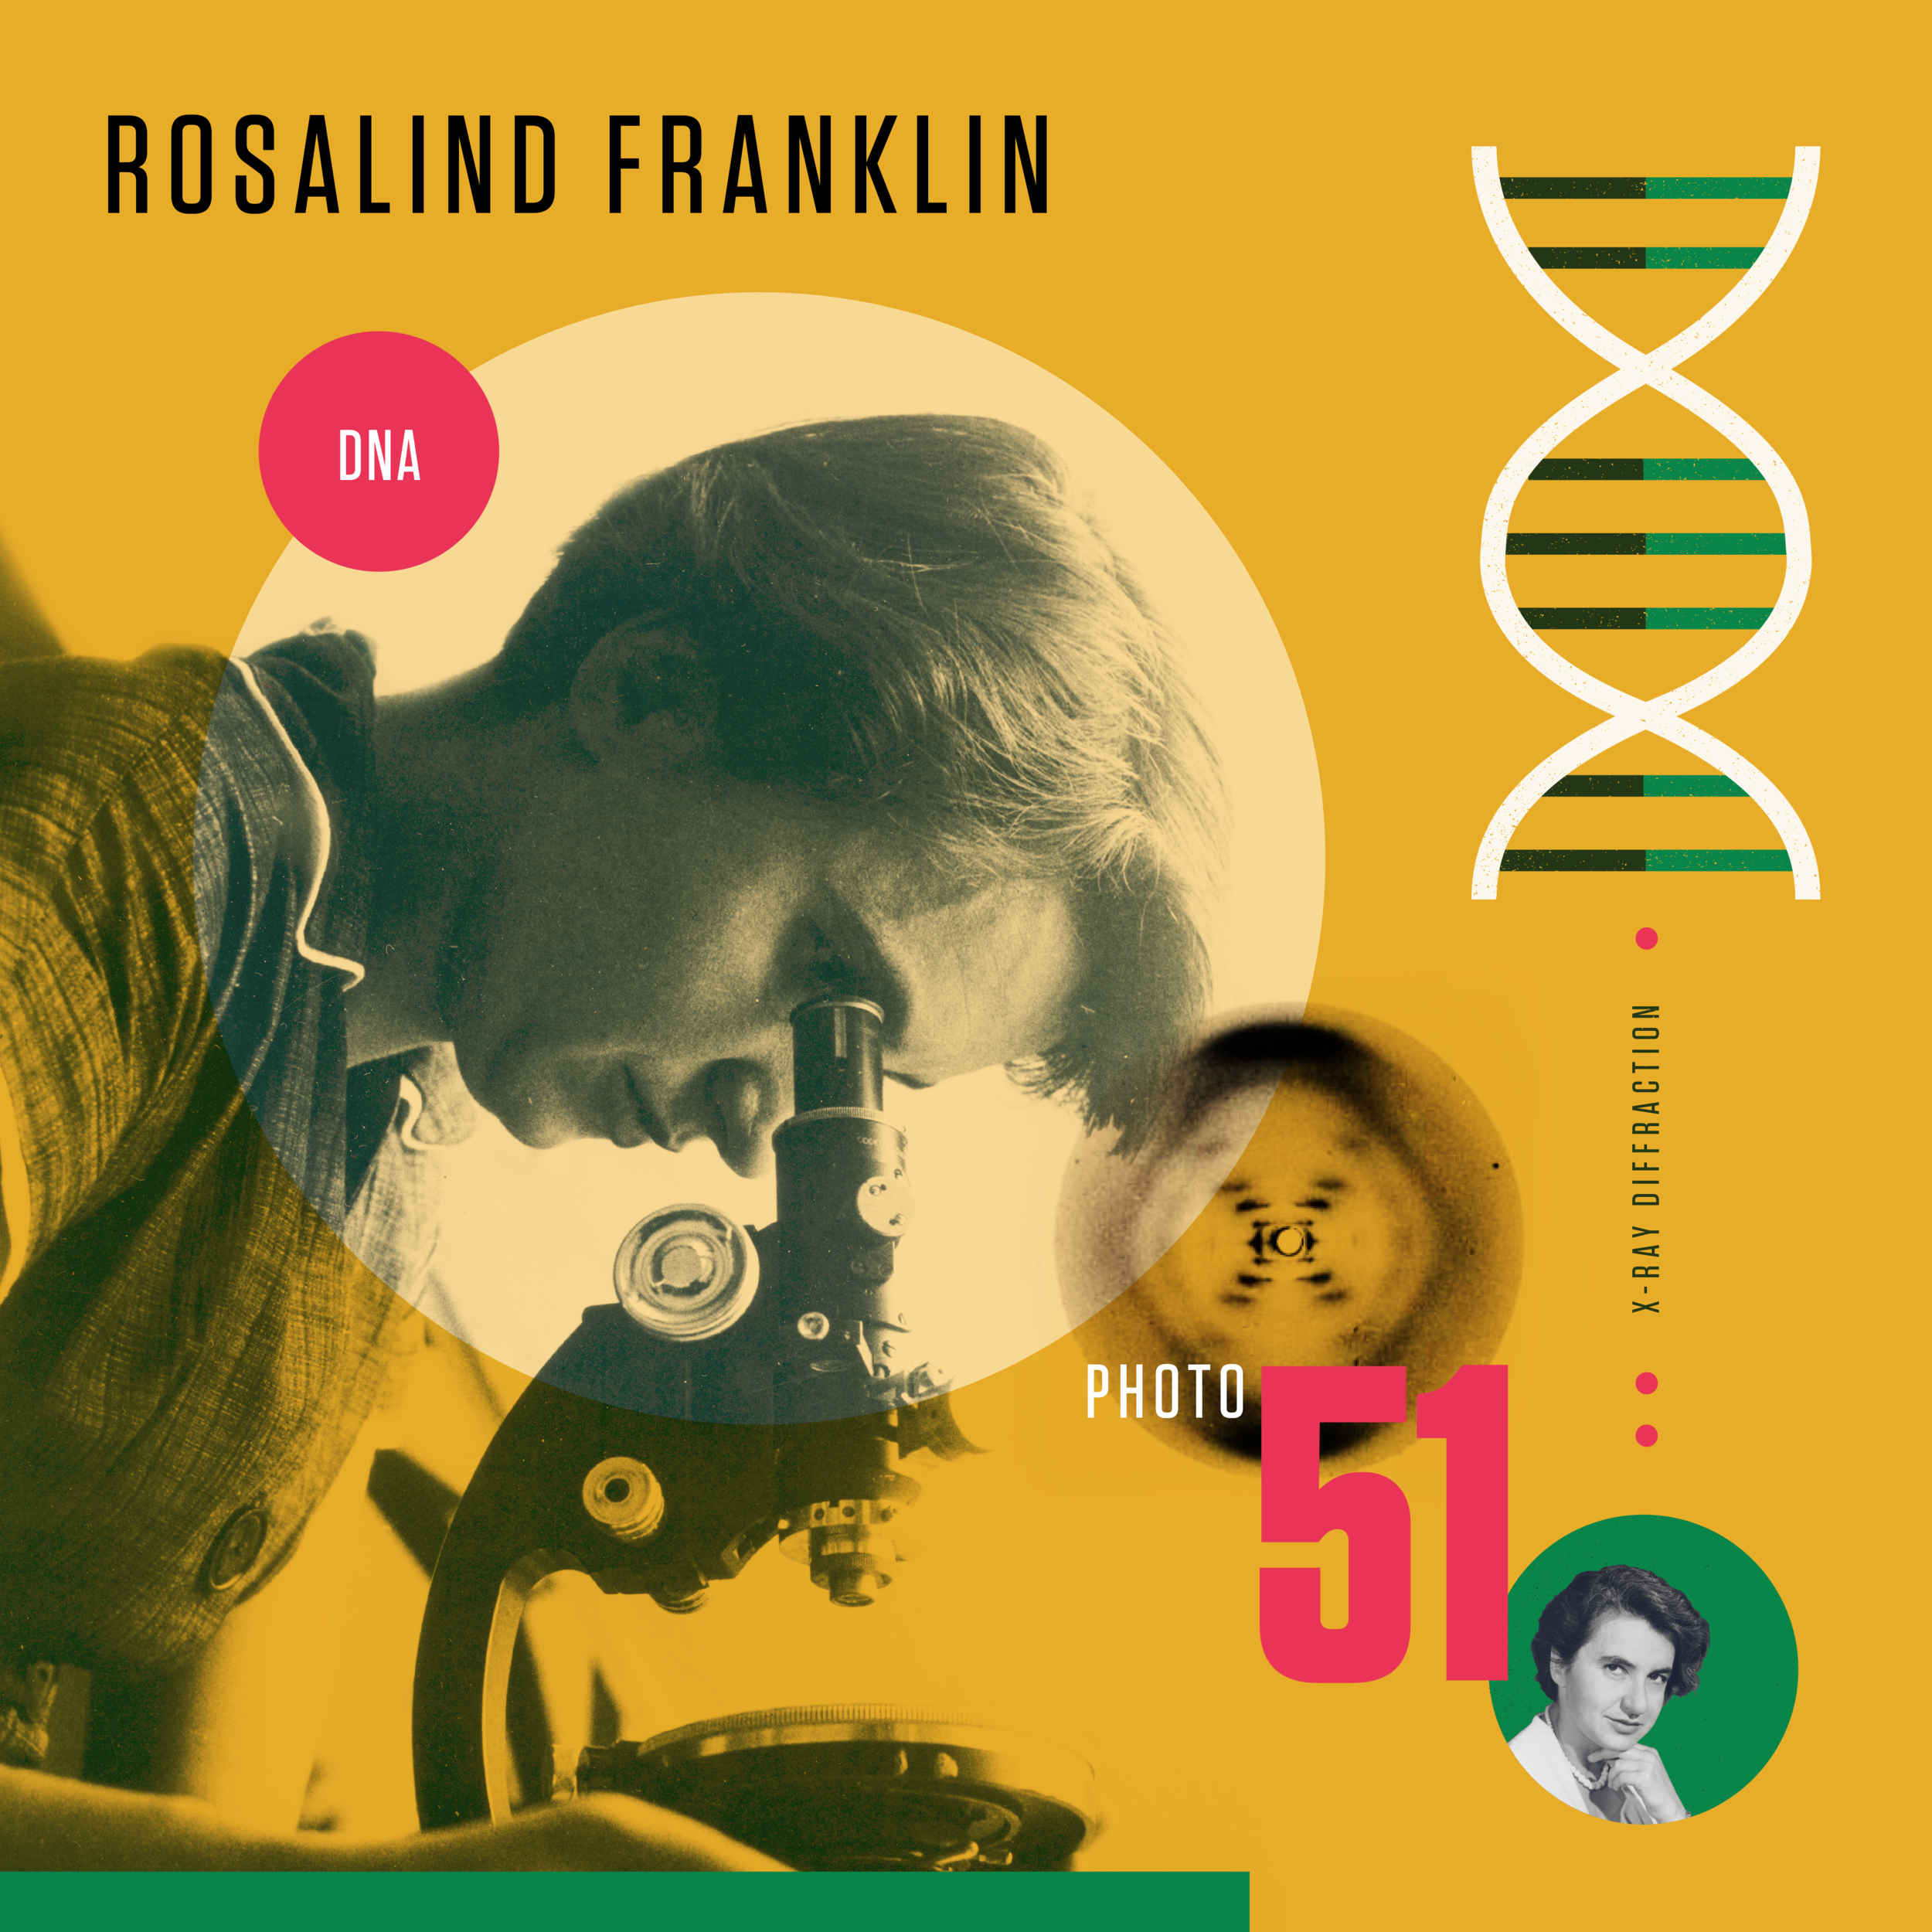 rosalind franklin beyond curie a design project celebrating women